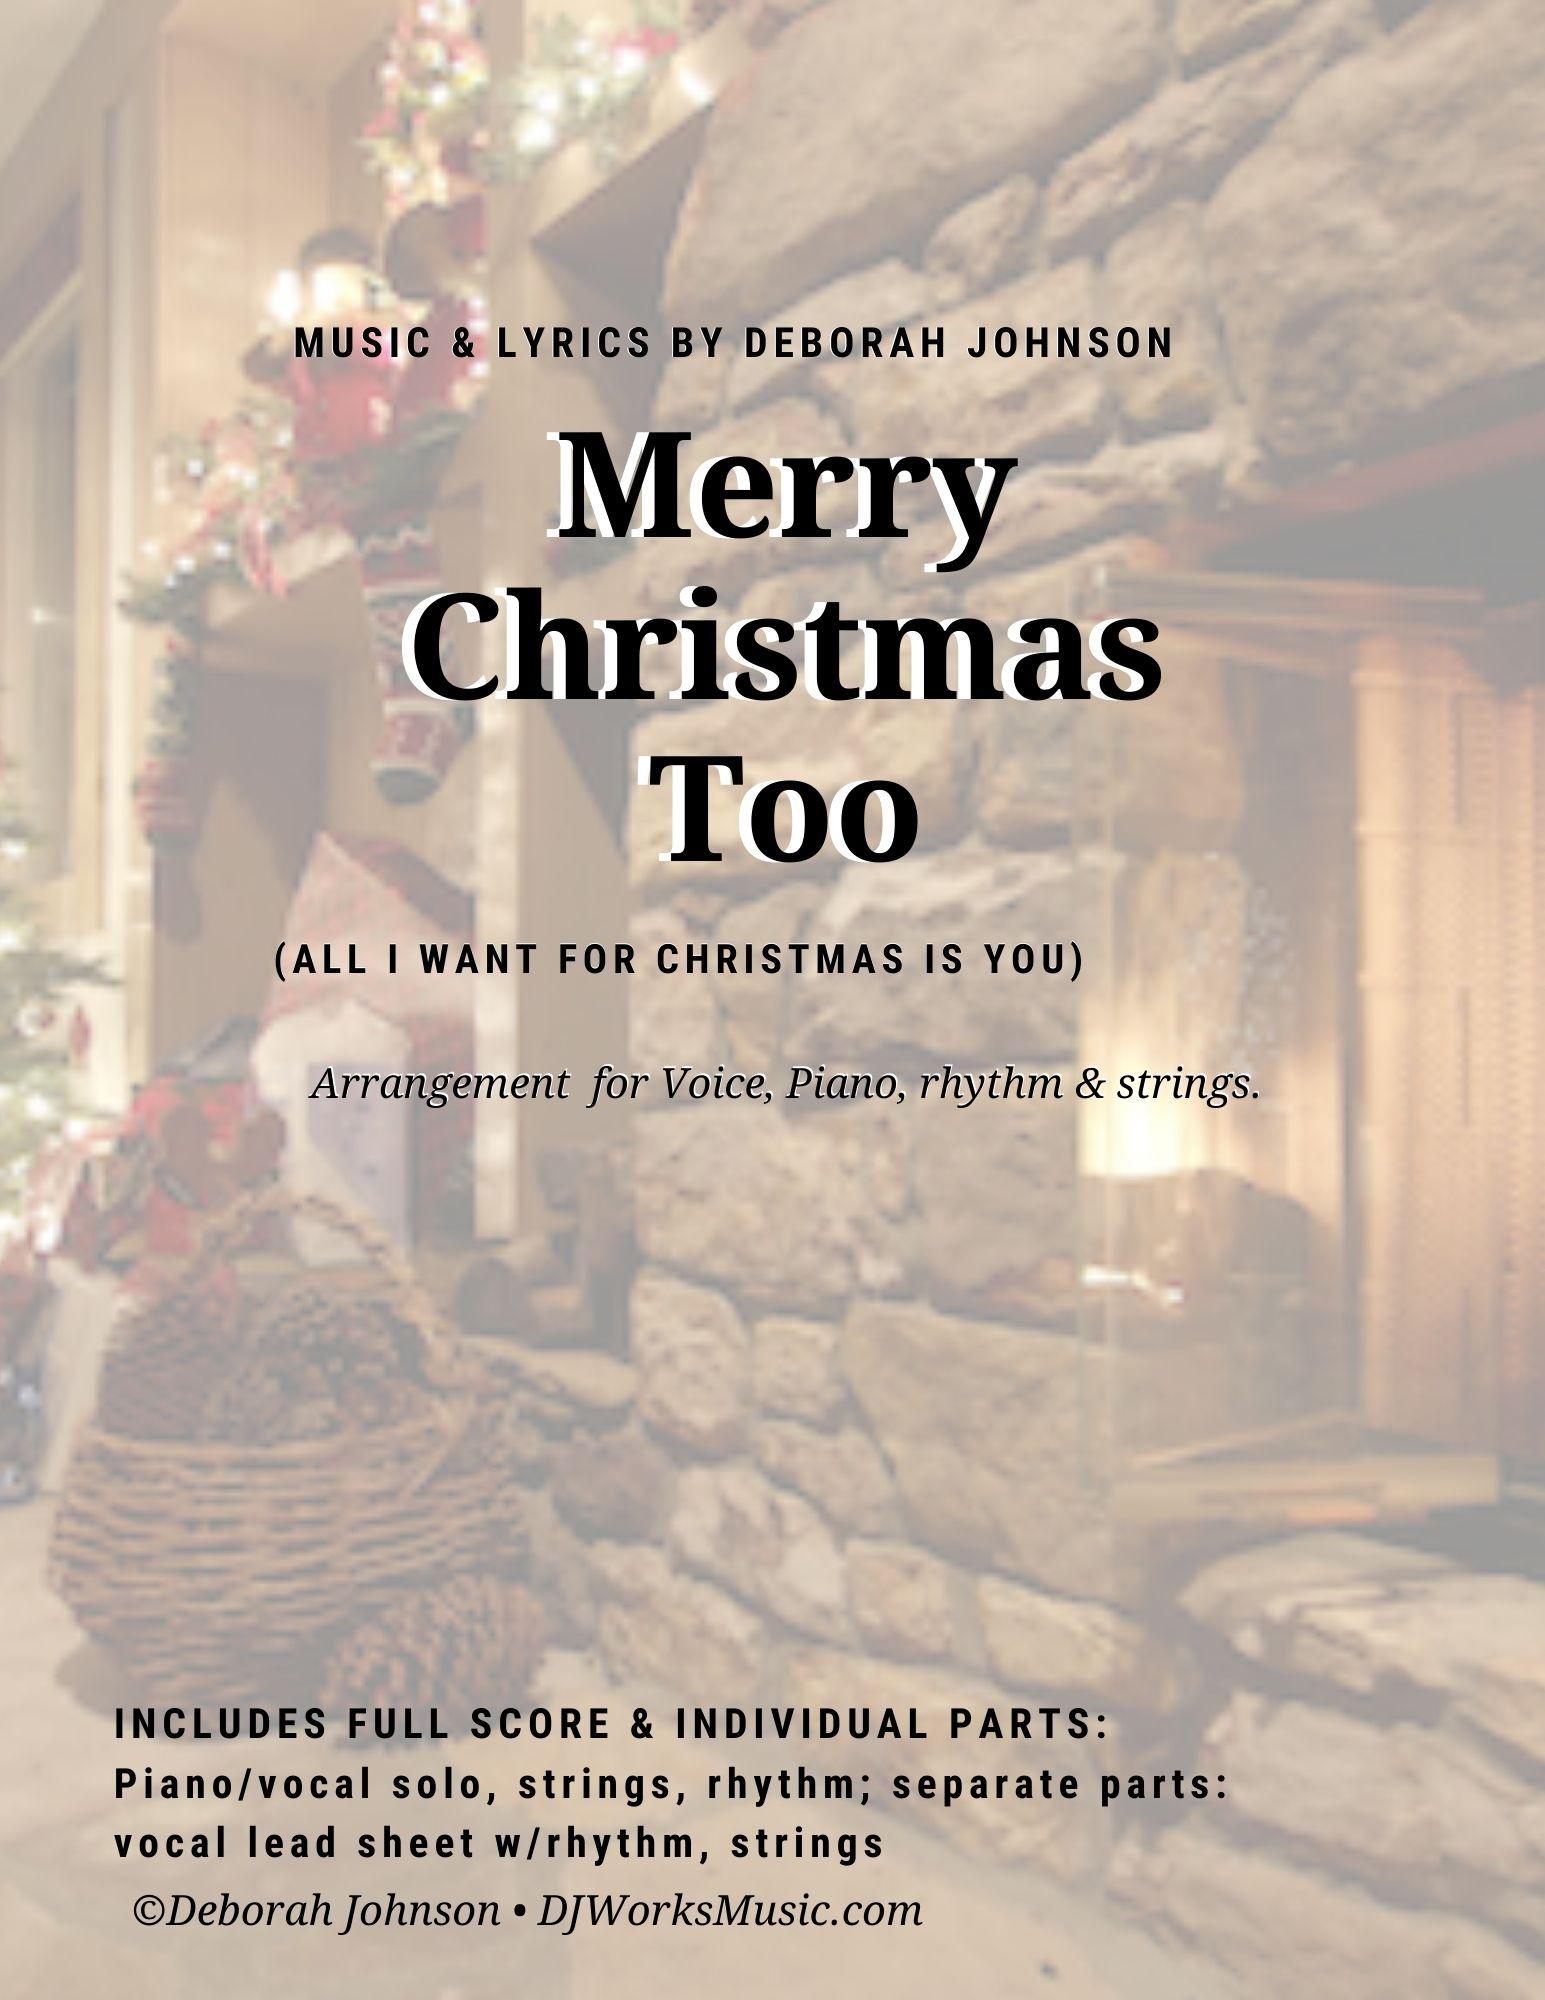 Merry Christmas Too Song Cover-Deborah Johnson